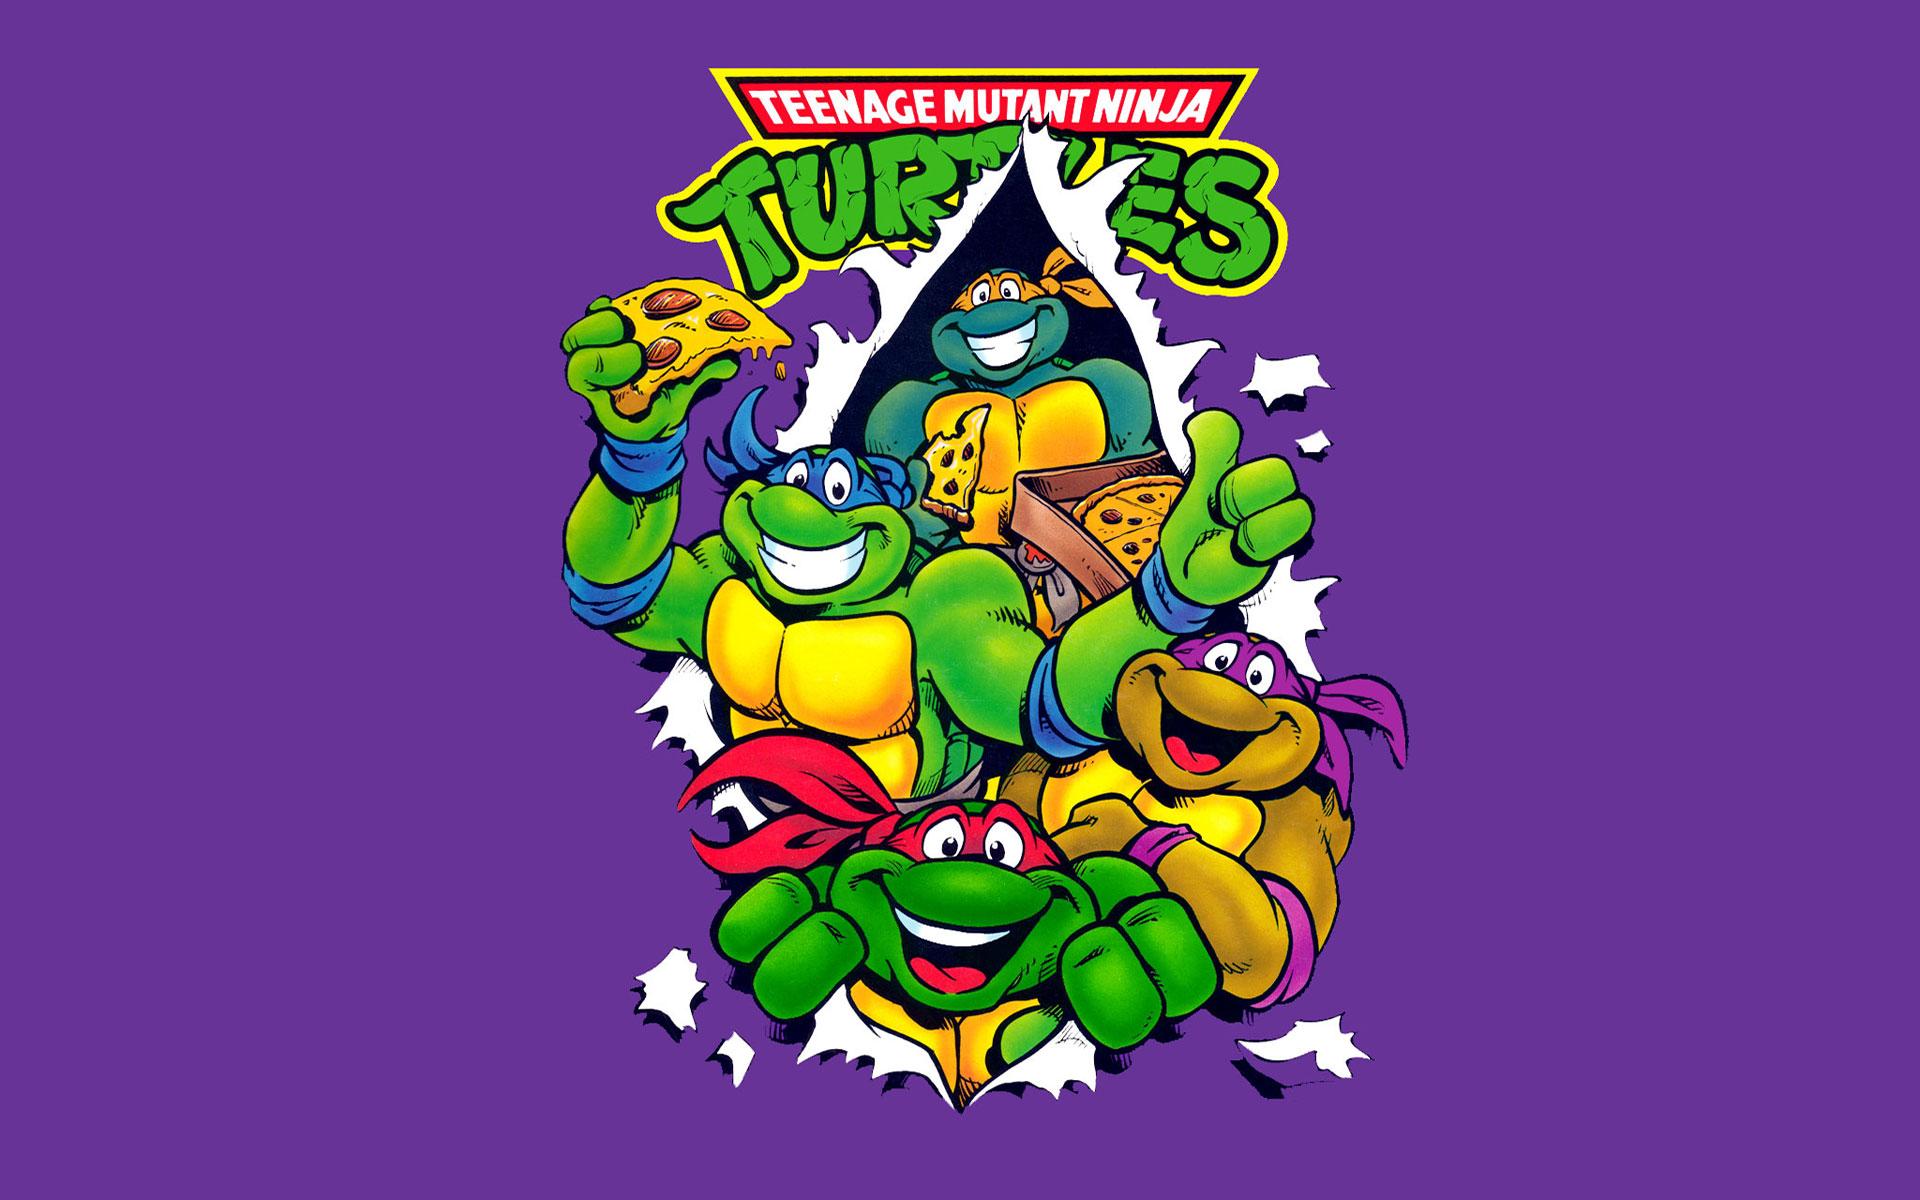 Ninja Turtles clipart high resolution  Mutant Quality Ninja HD